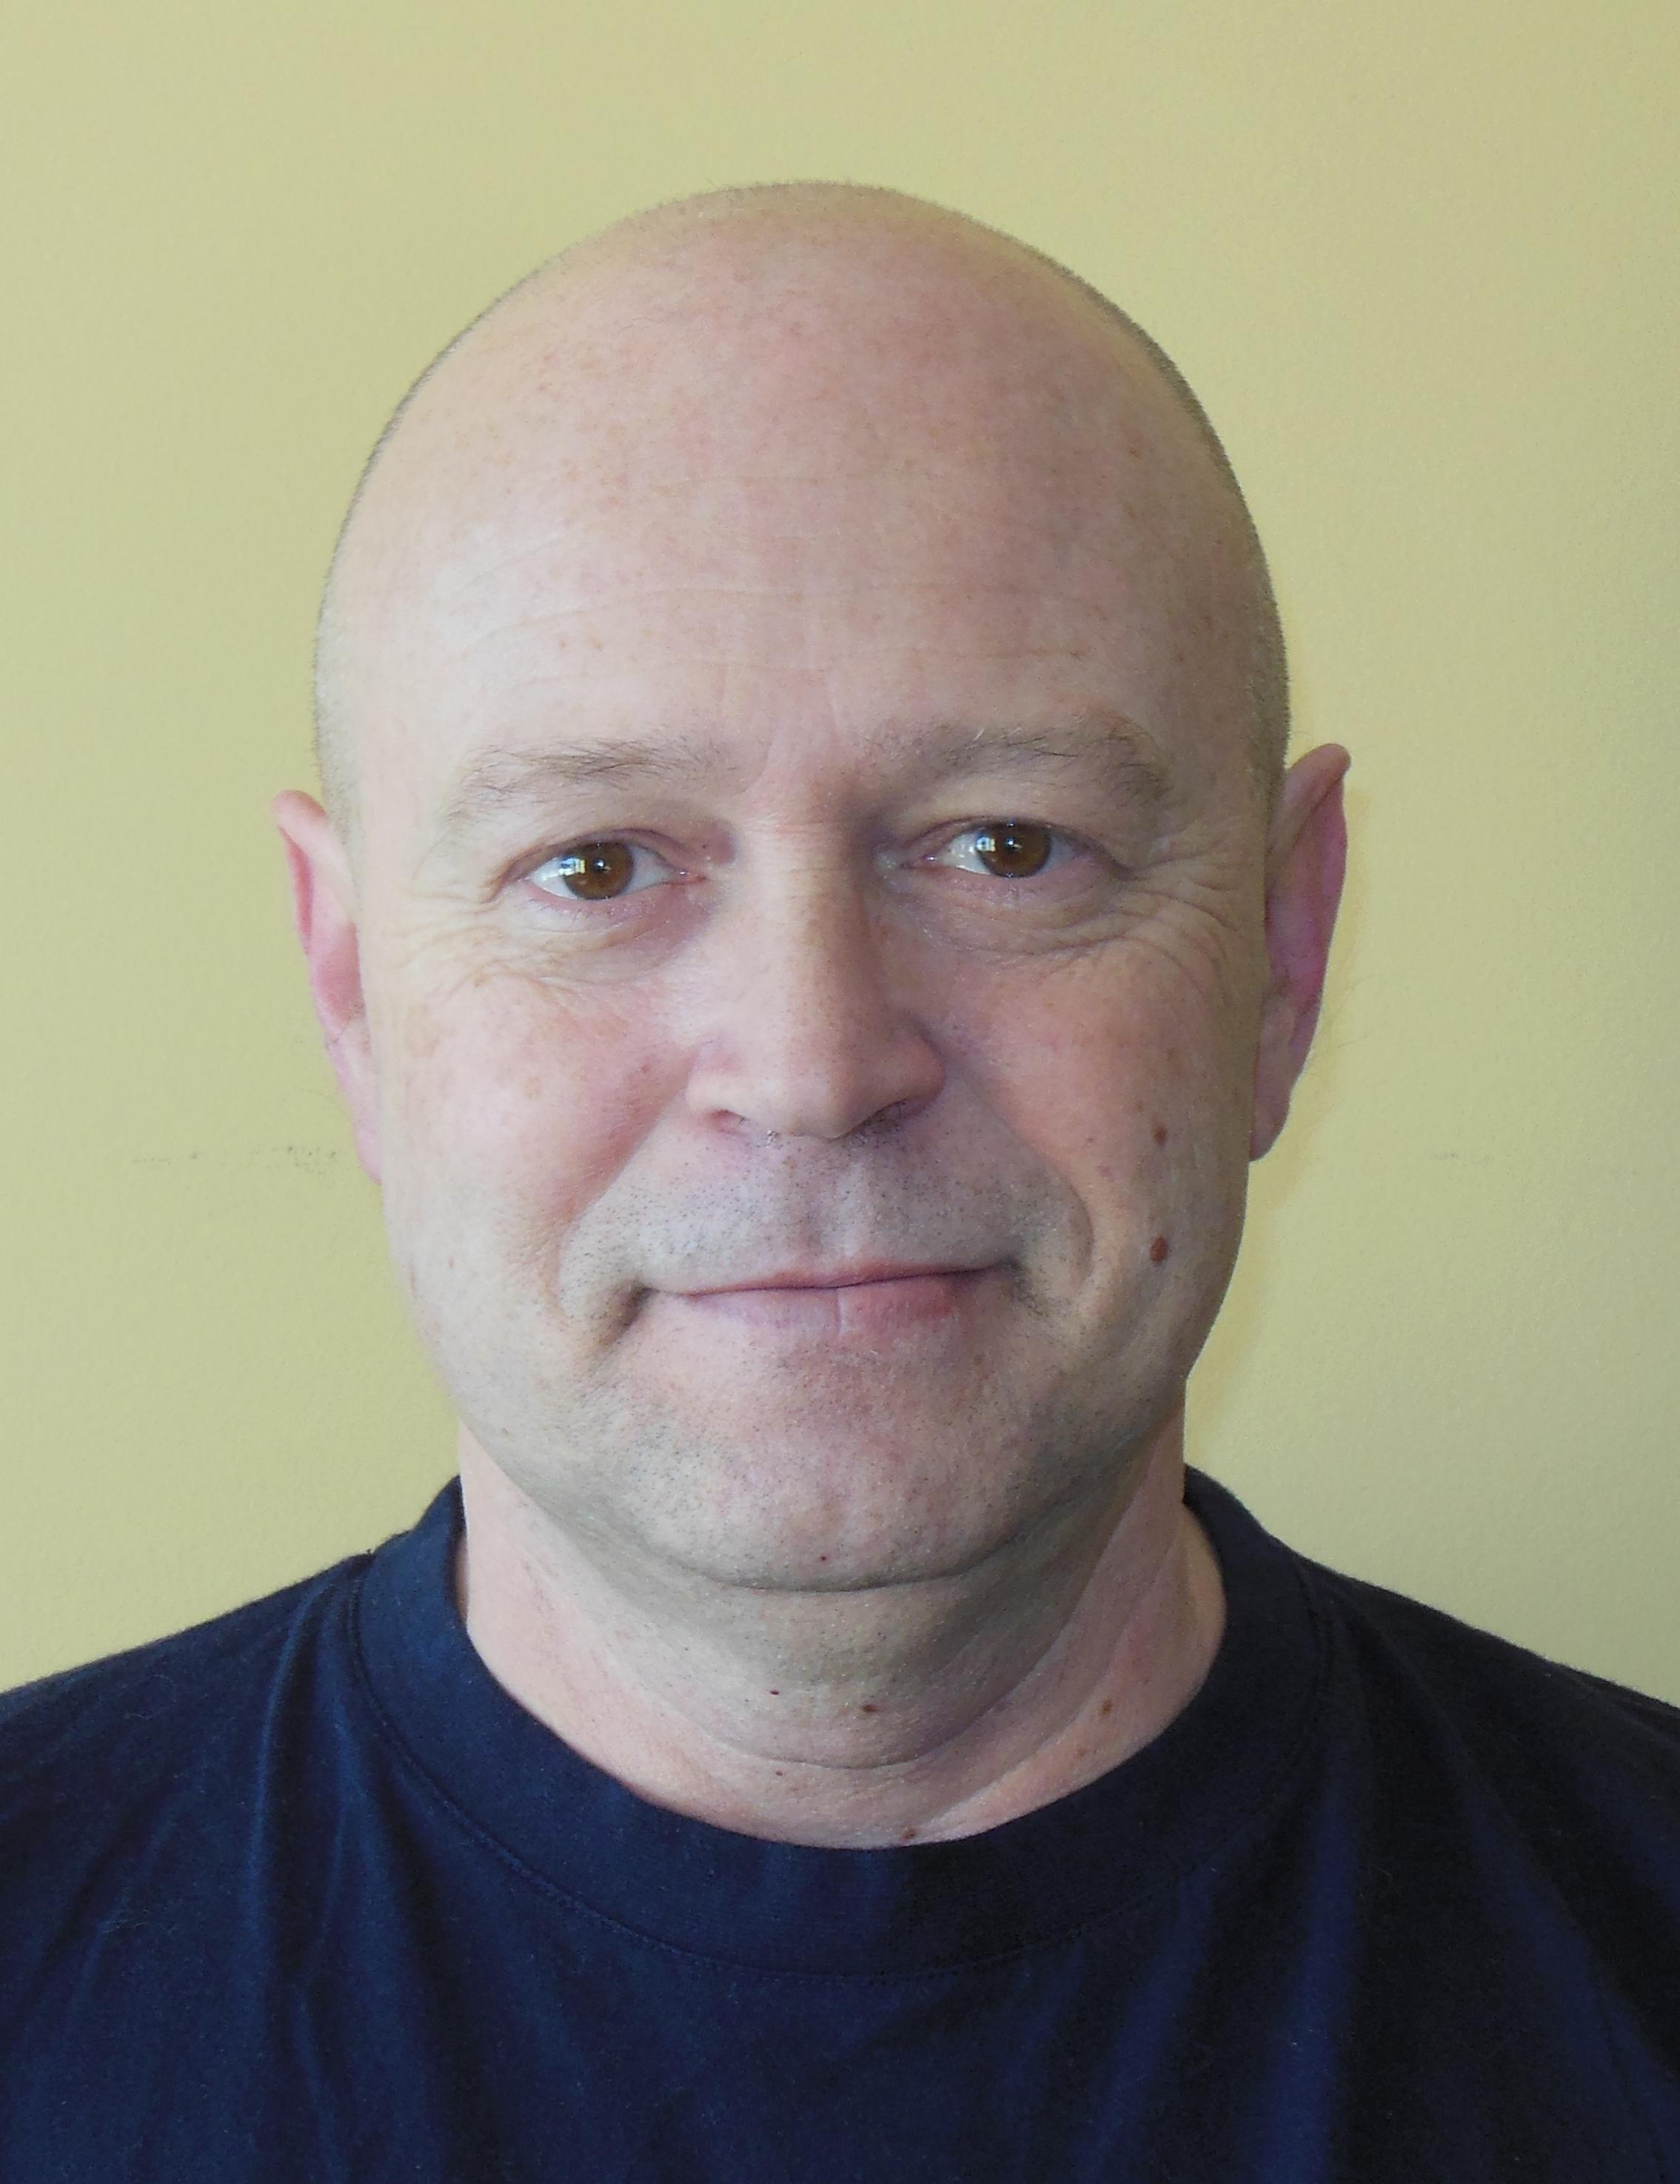 Andrew Krivanek